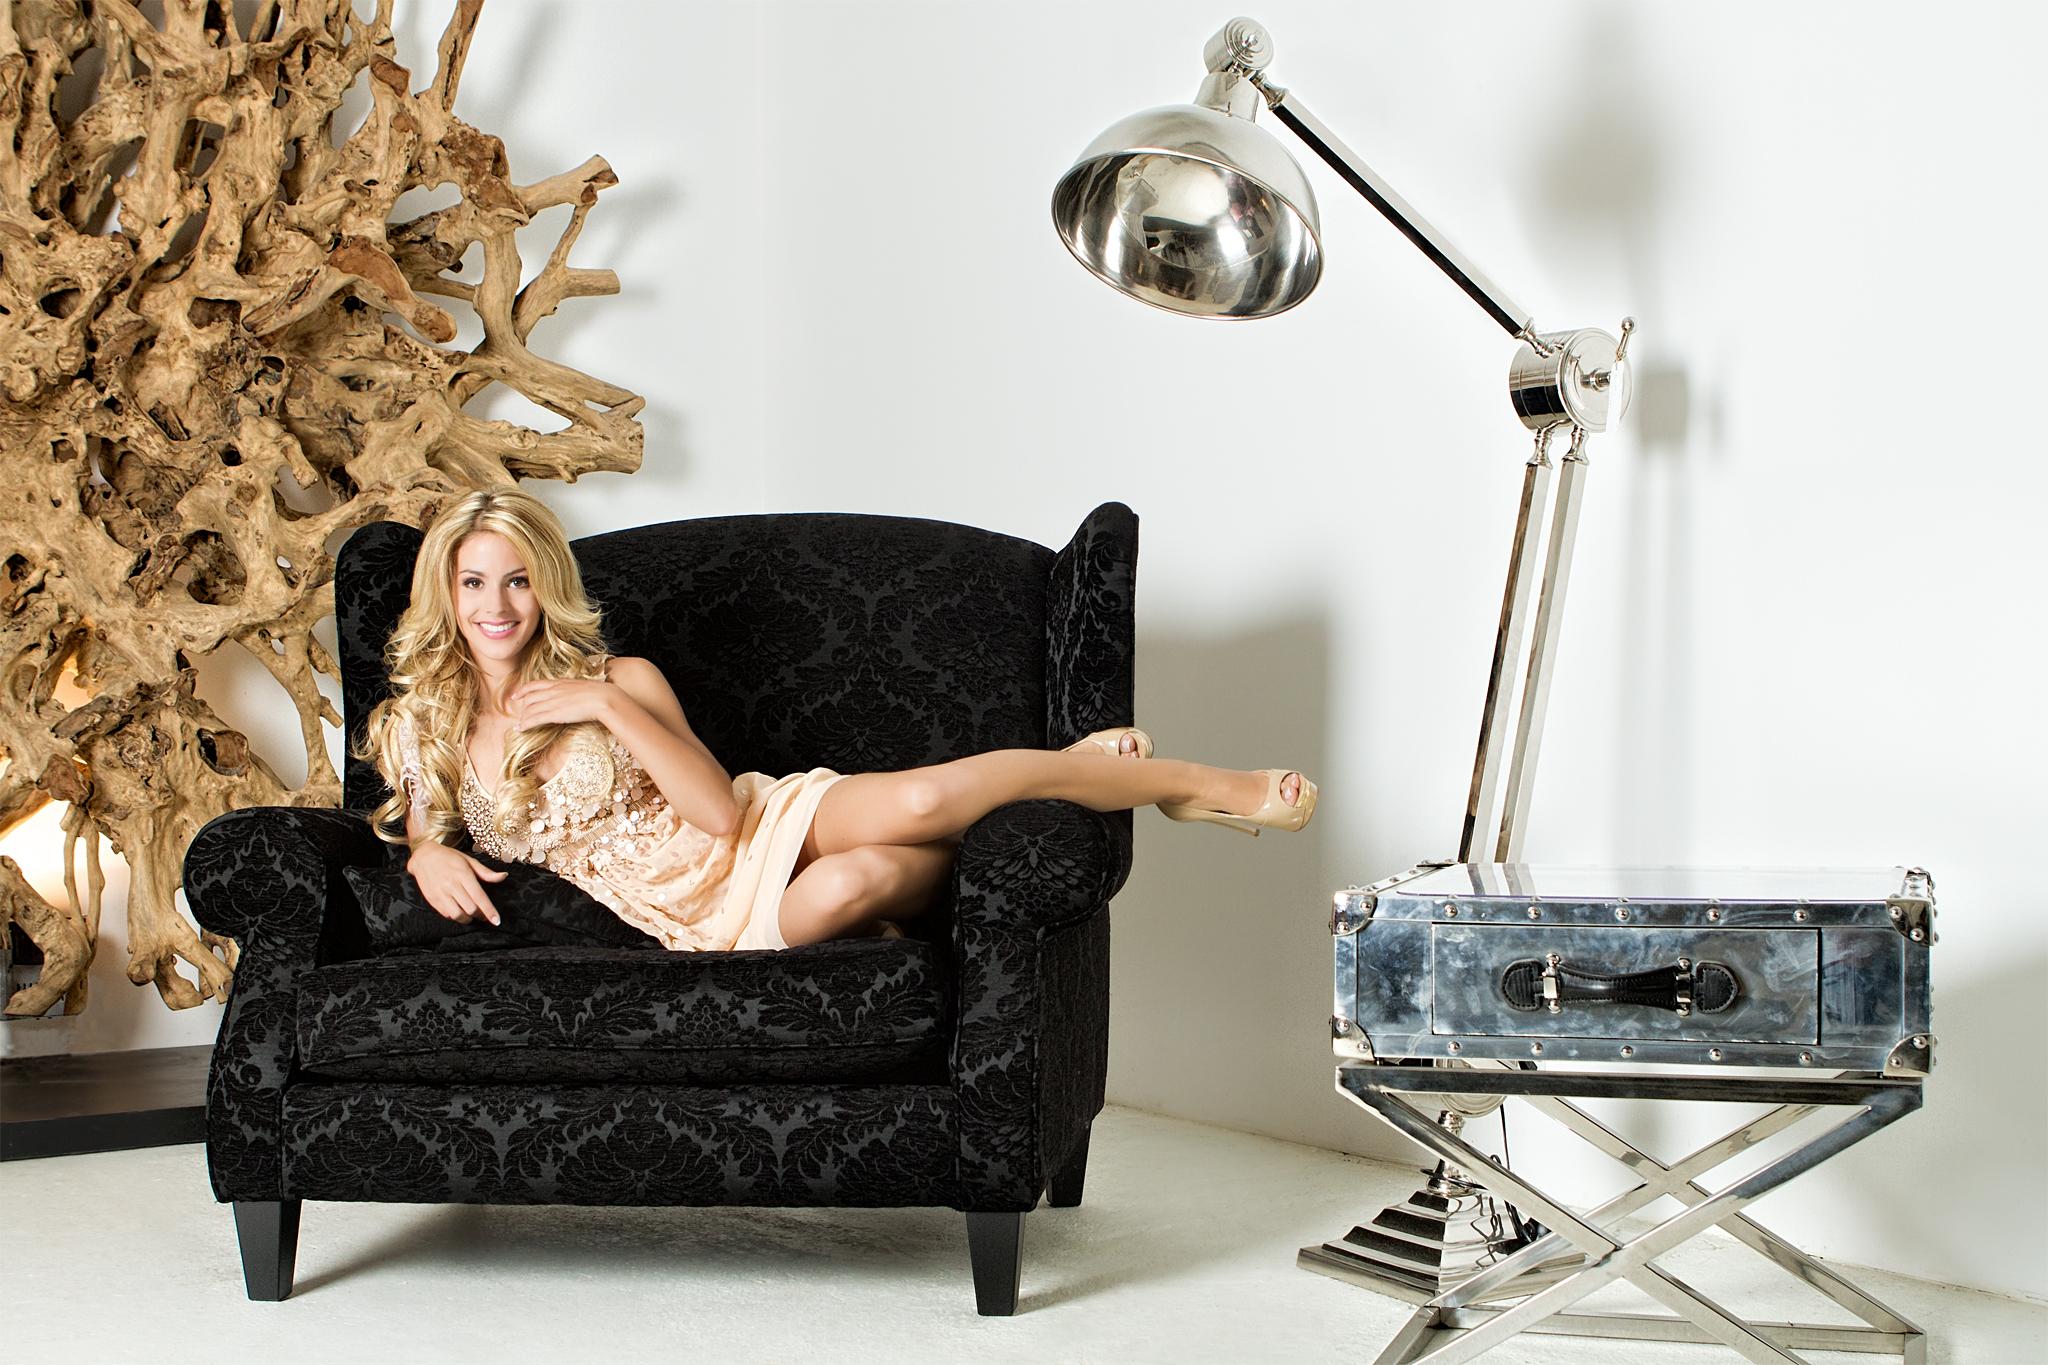 Miss Netherlands 2012 Nathalie Den Dekker